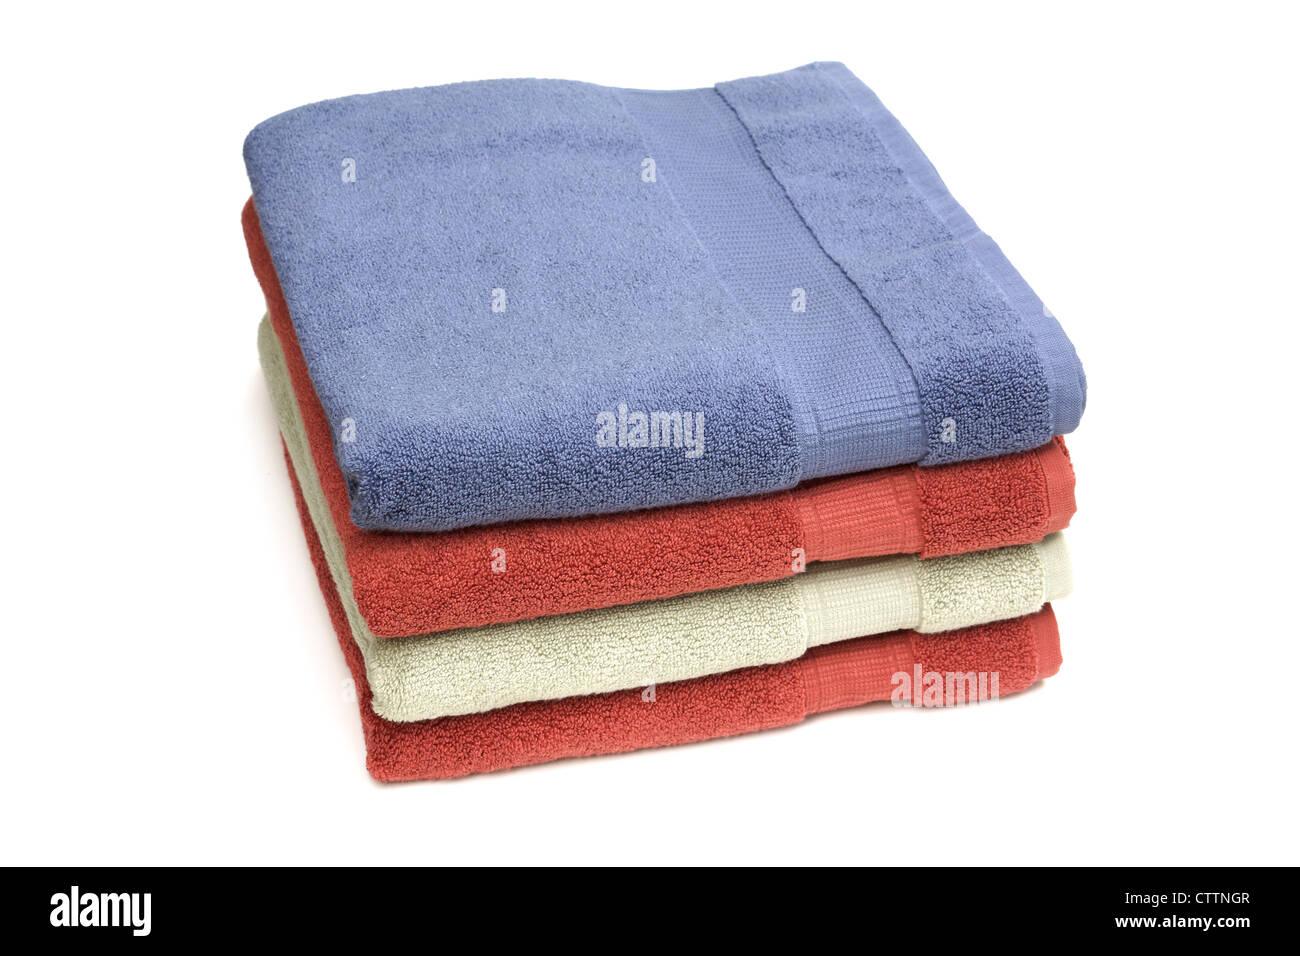 Asciugamani Foto Stock